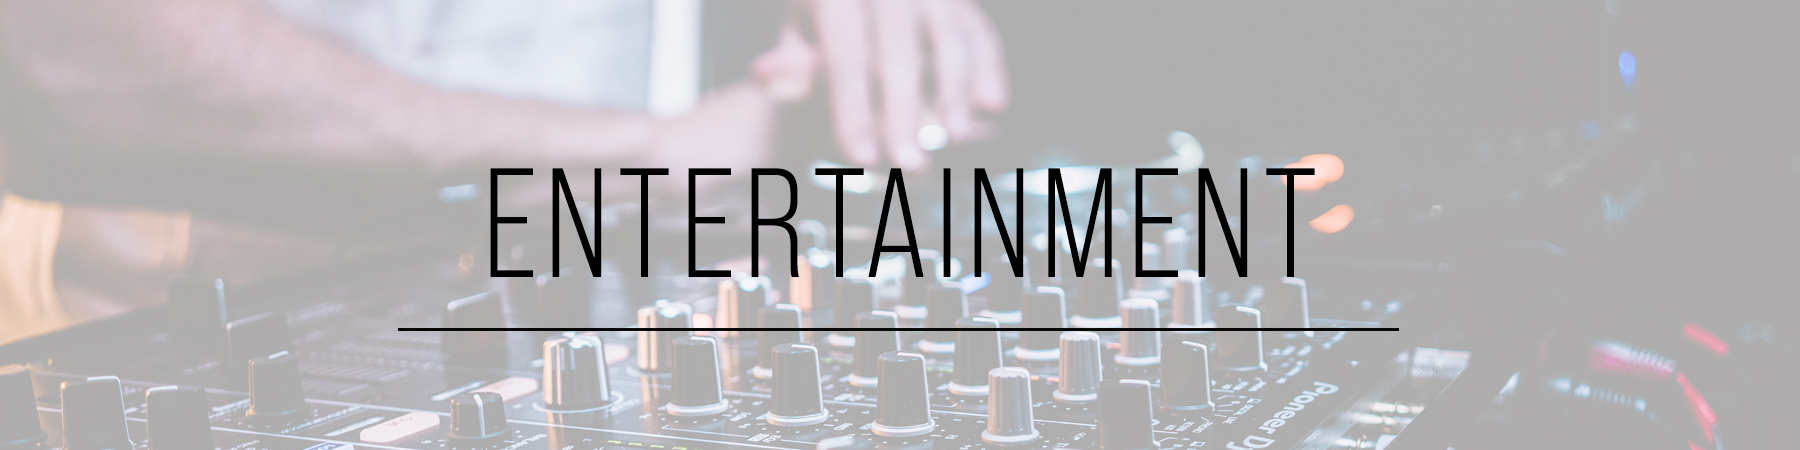 entertainment_header